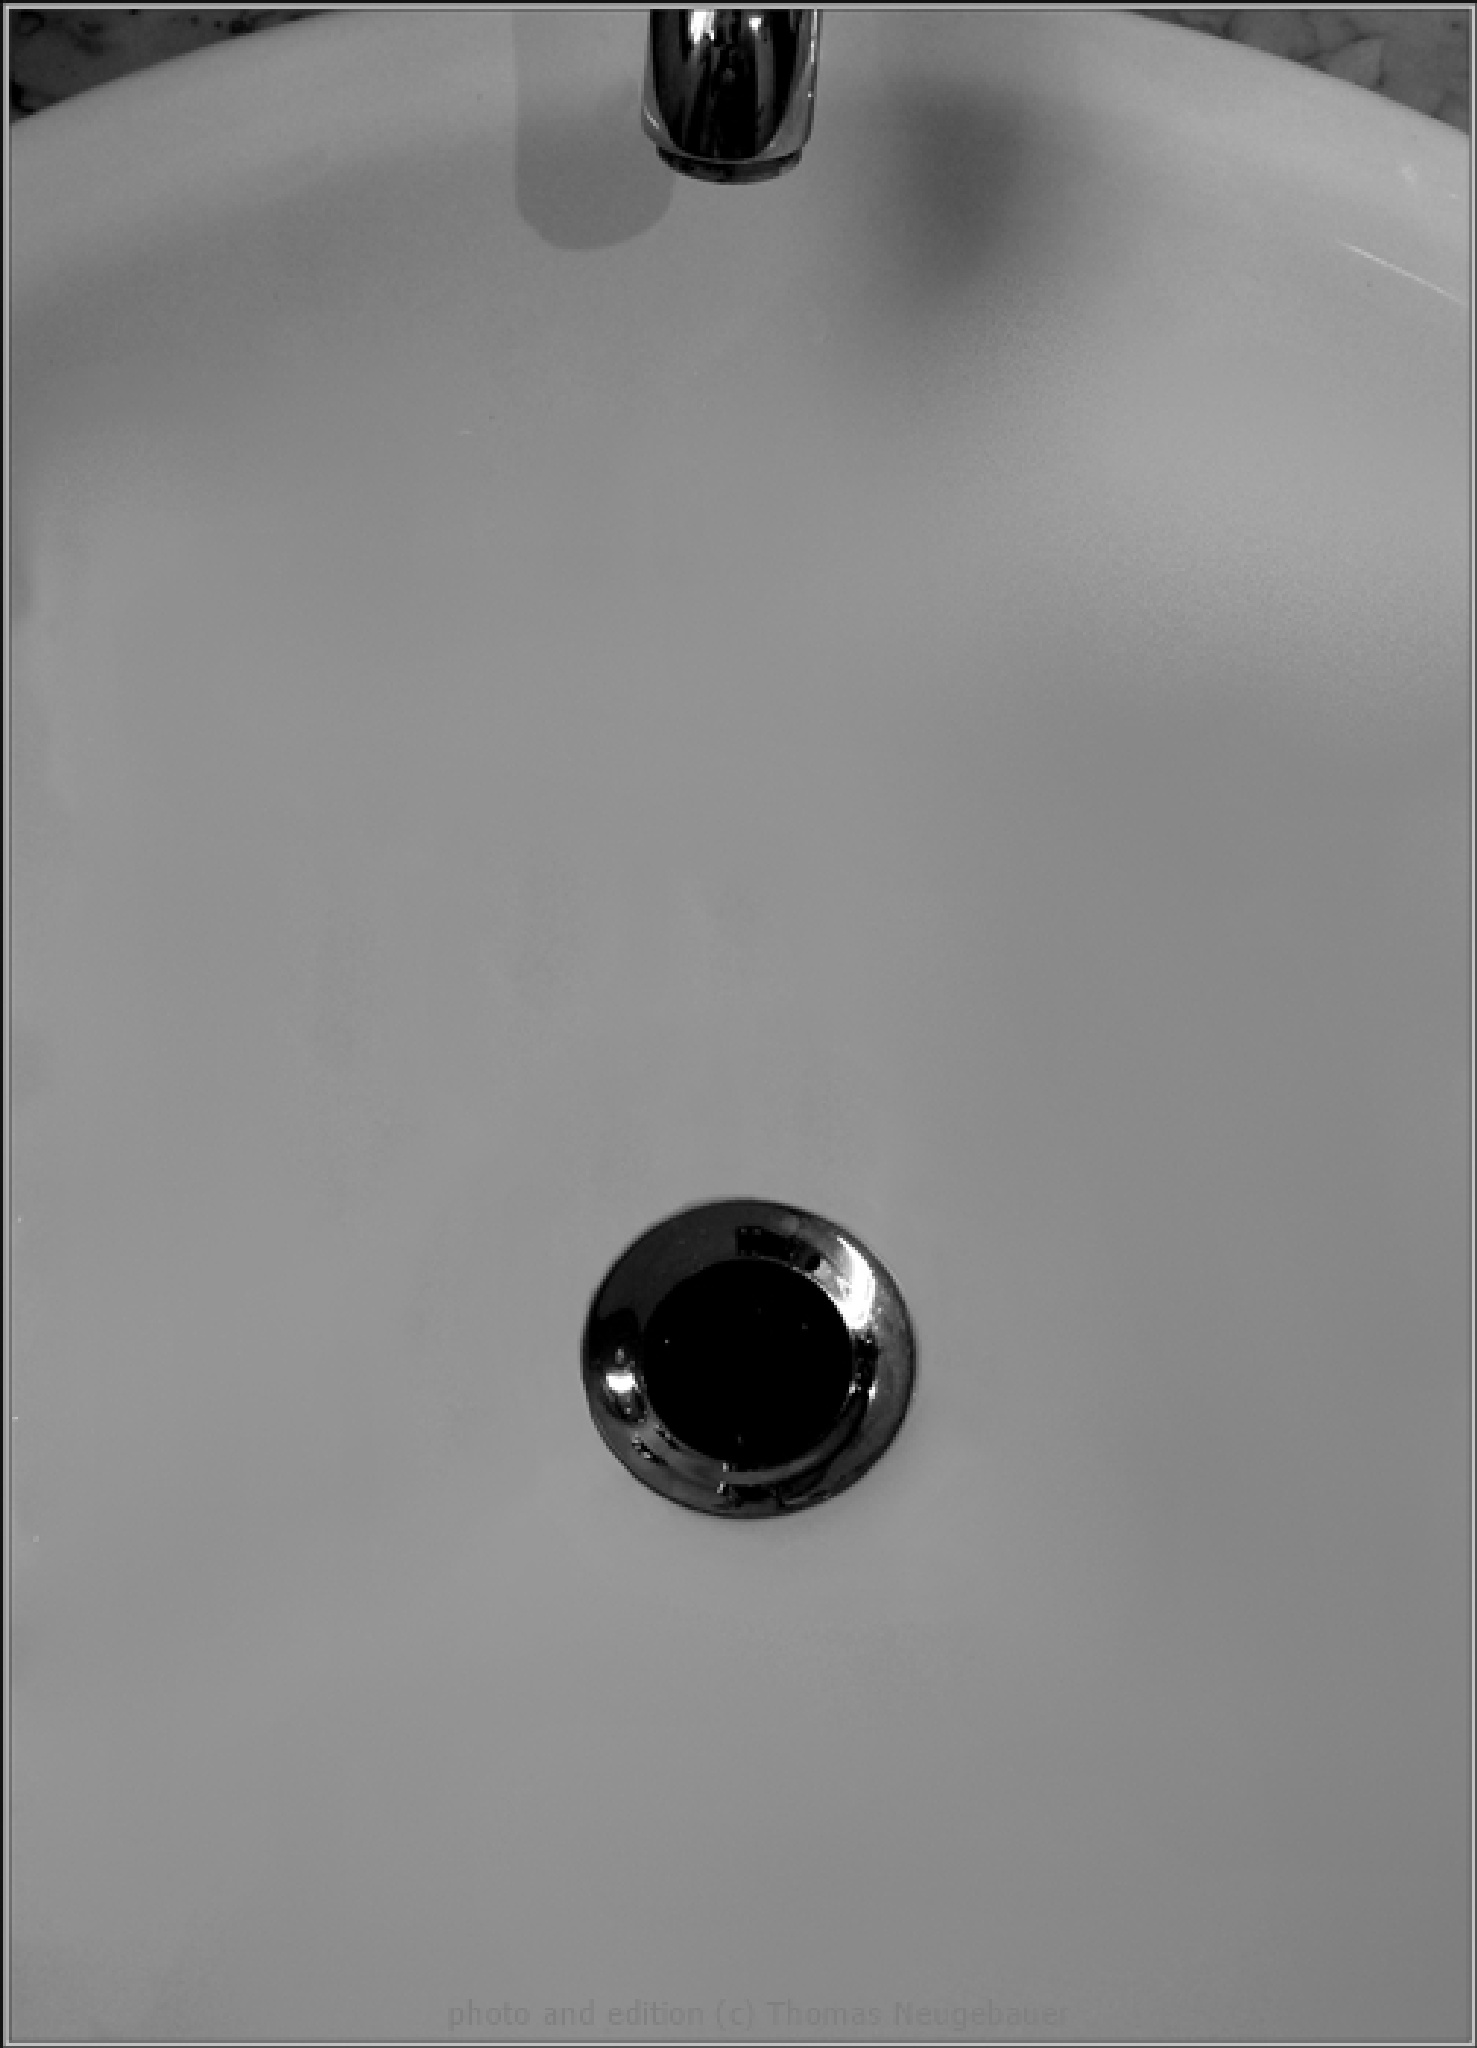 # 607 by Thomas Neugebauer